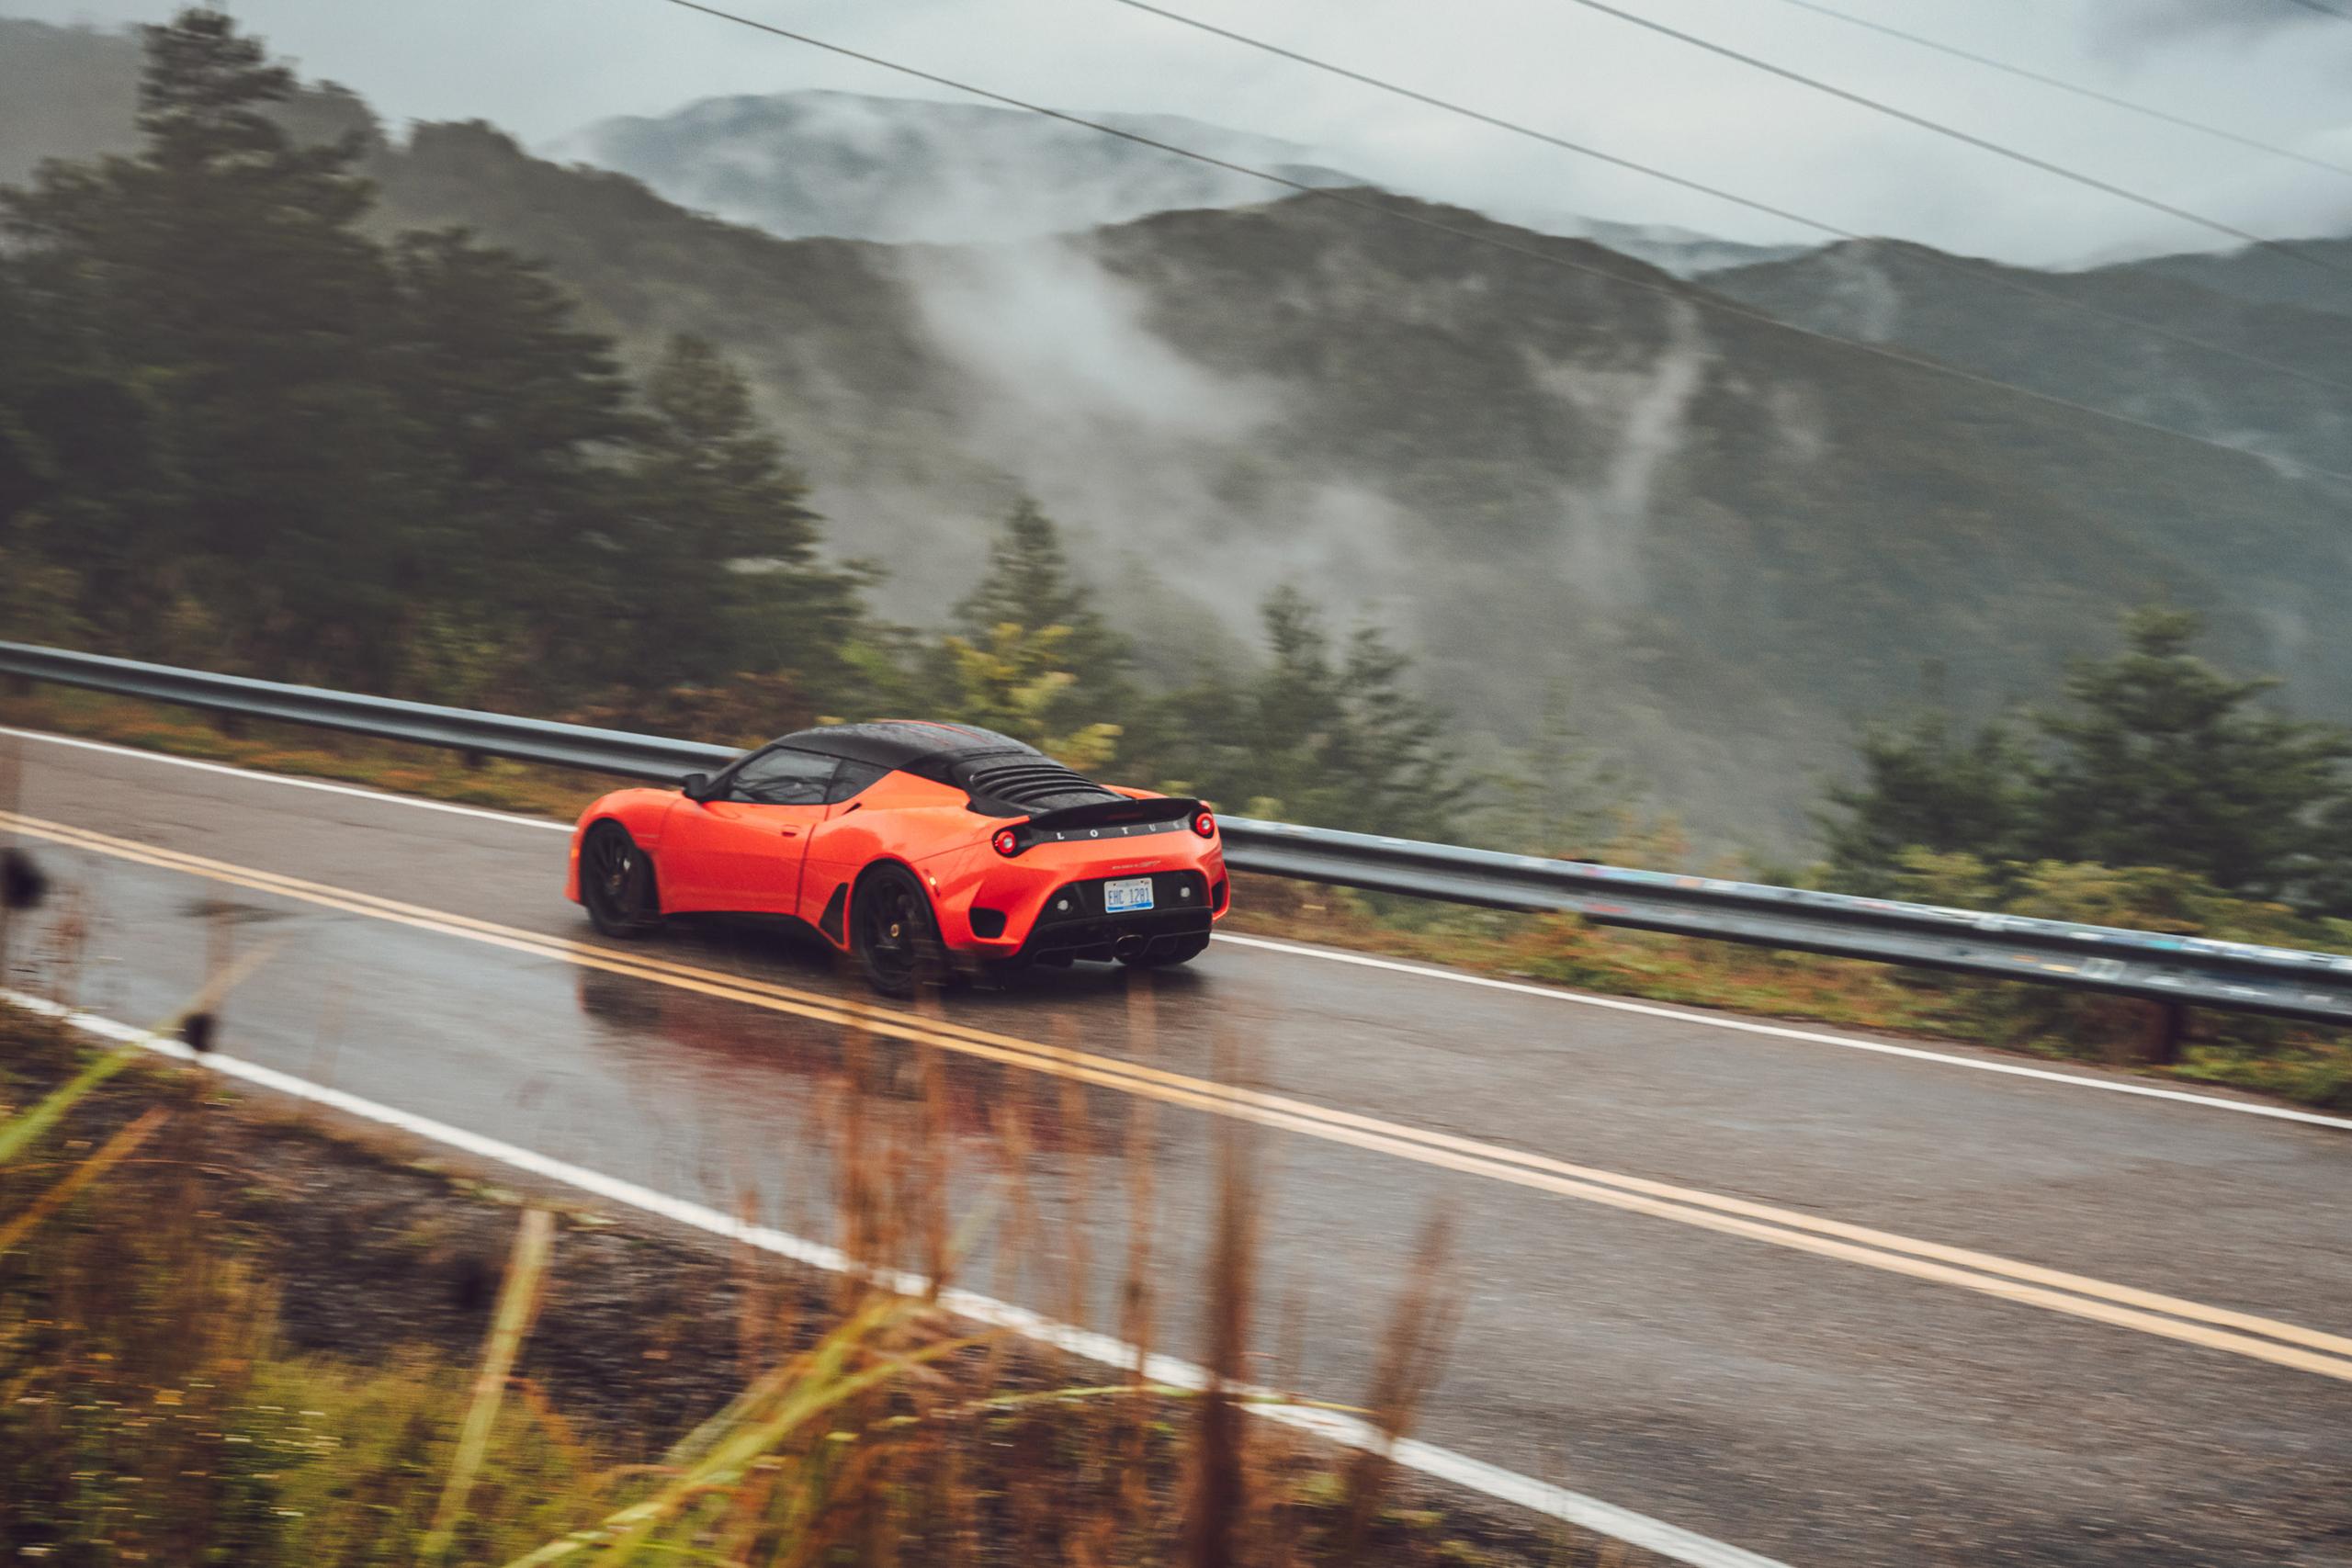 Lotus Evora GT rear